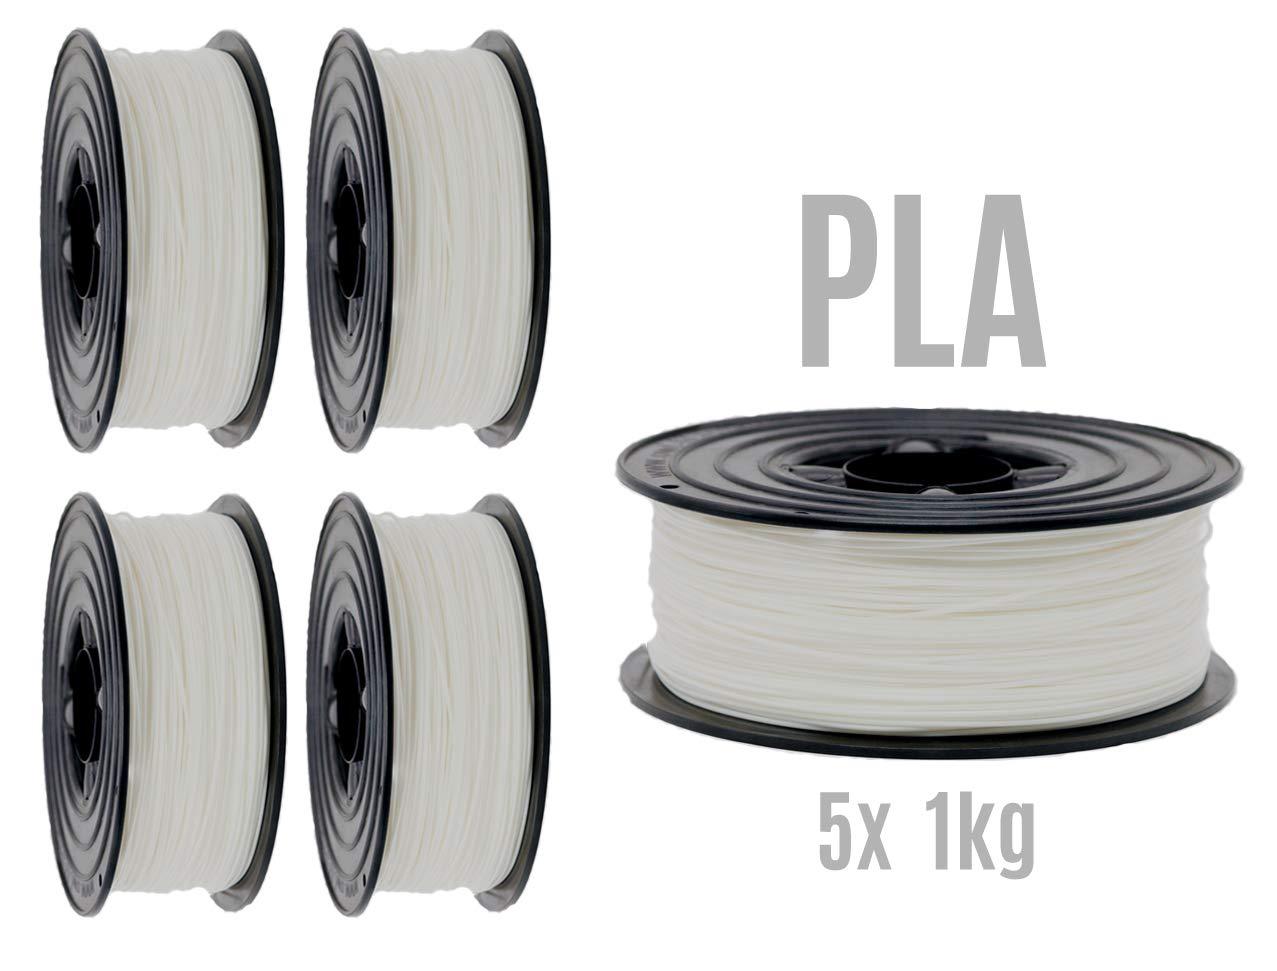 Filamento PLA para impresora 3D, 1,75 mm / 5 x 1 kg, rollo ...